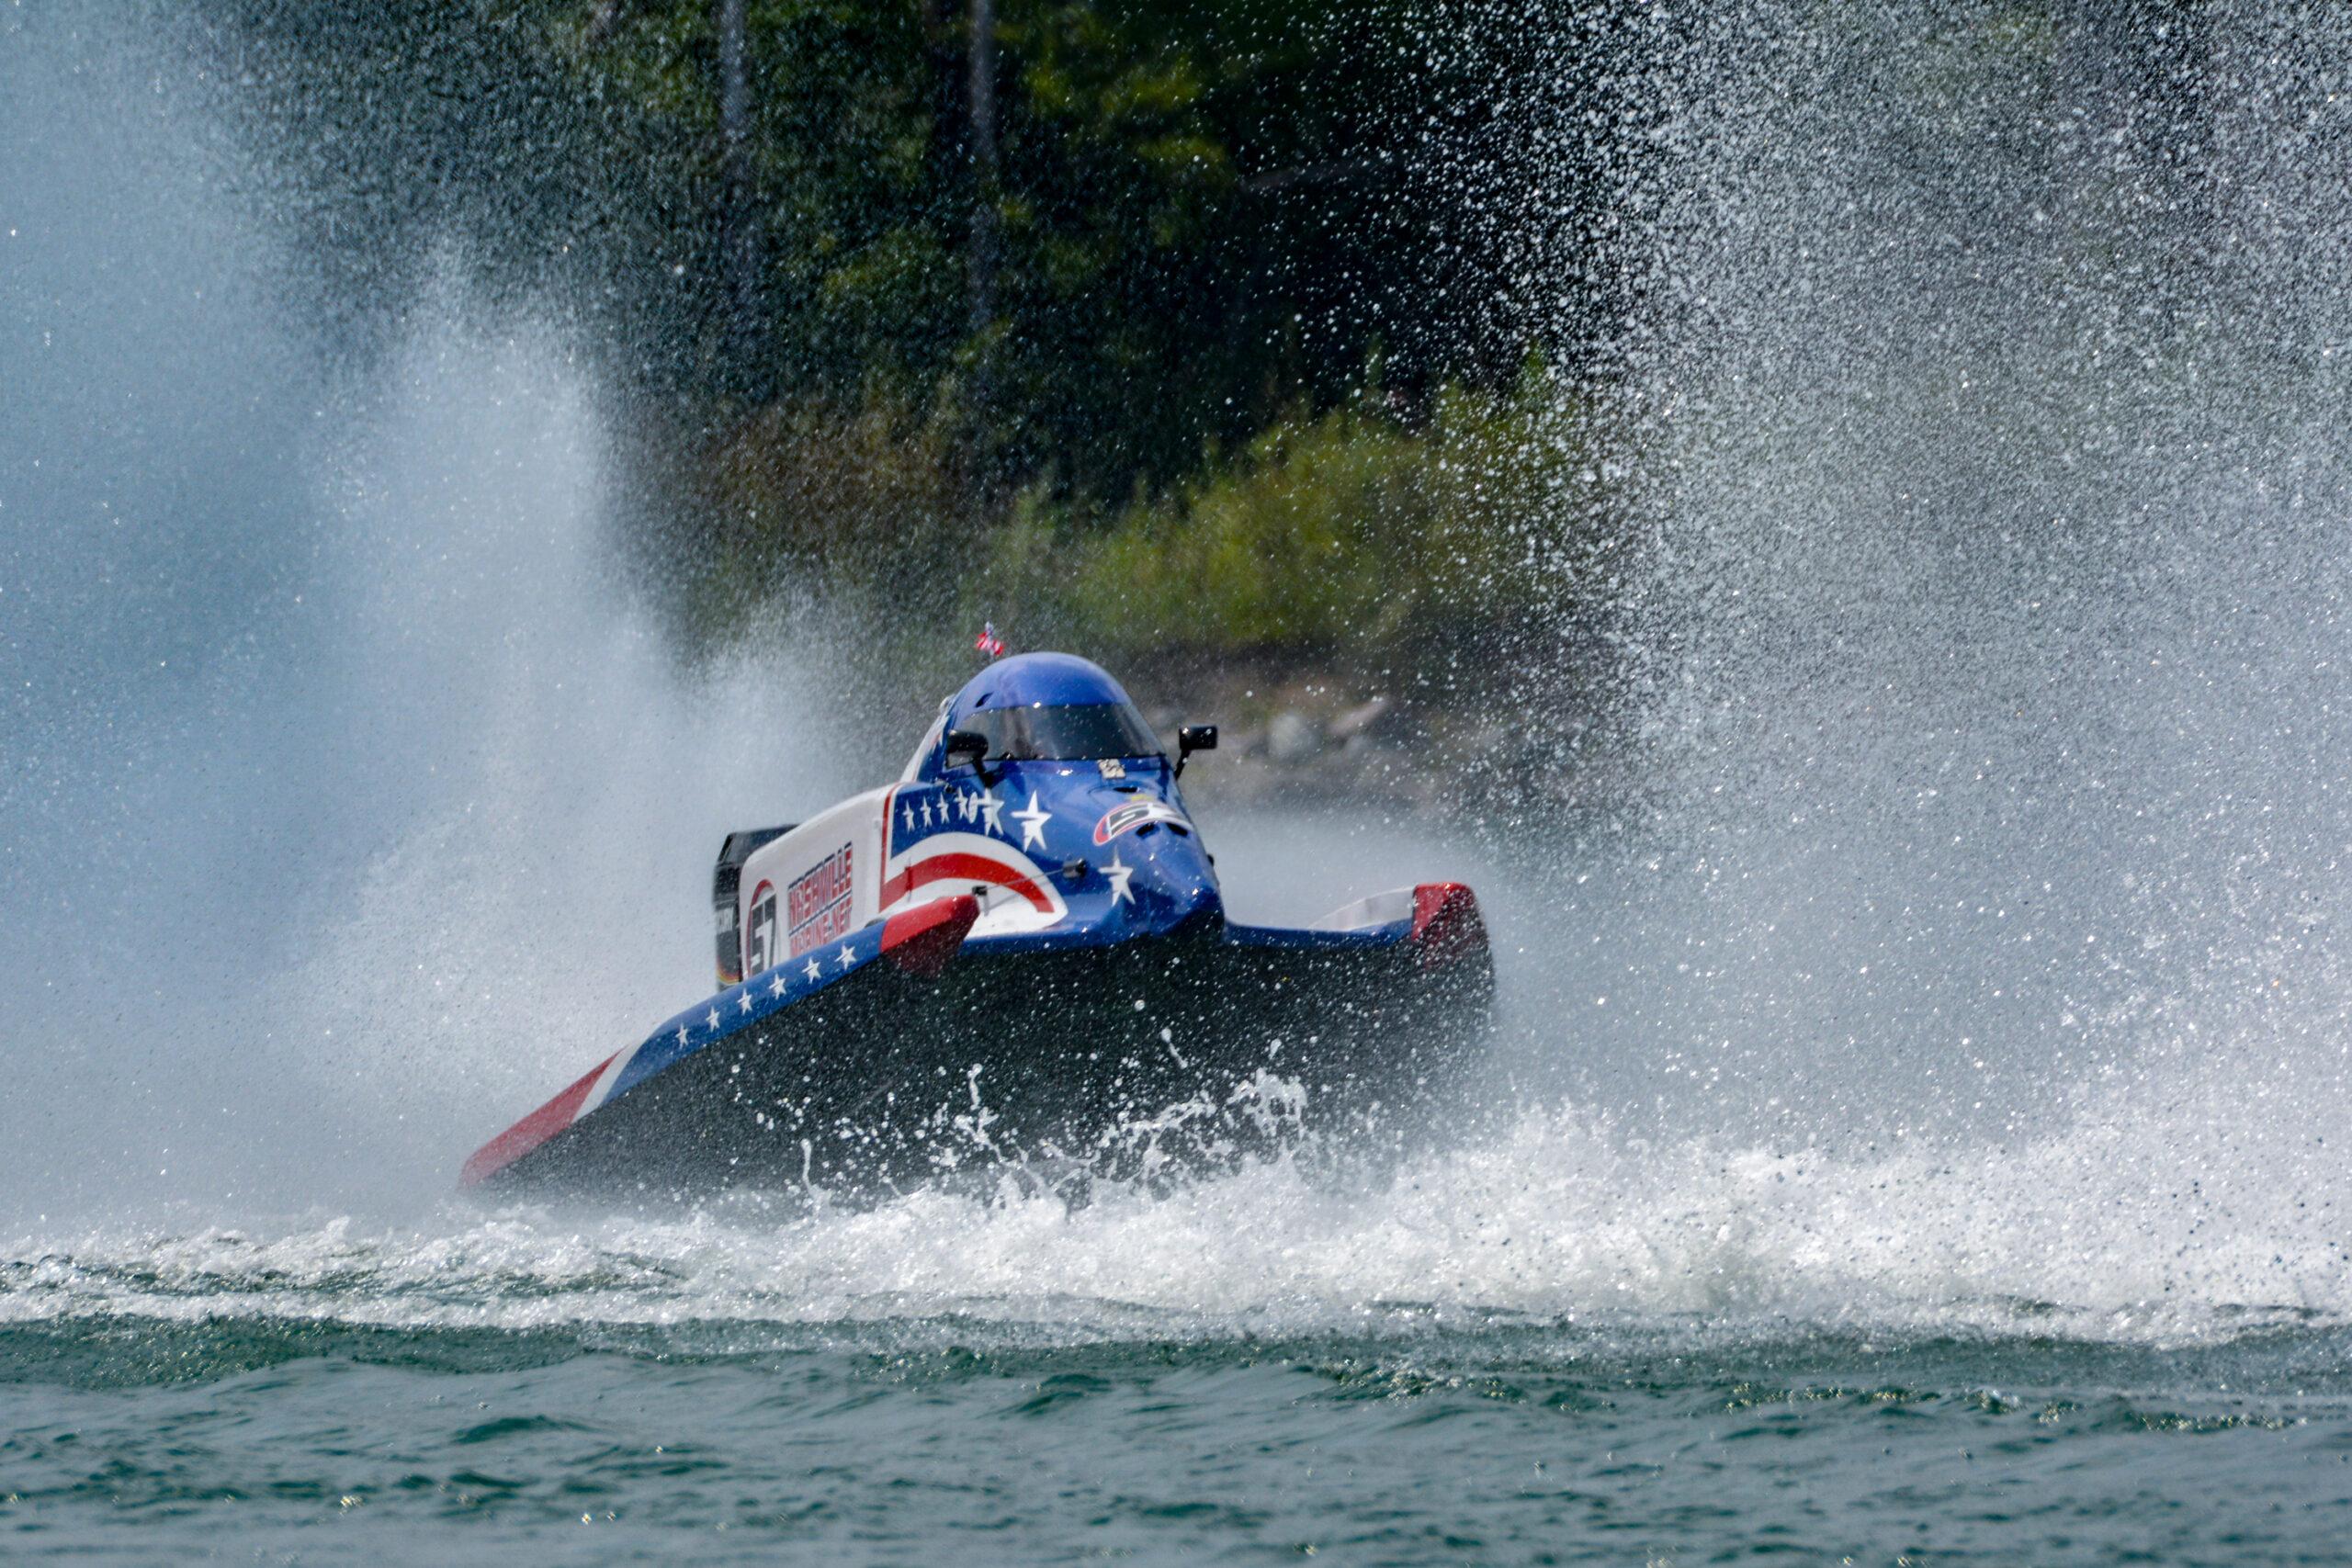 McMurray Racing Nashville Marine 2021 Springfield F1 Race-59